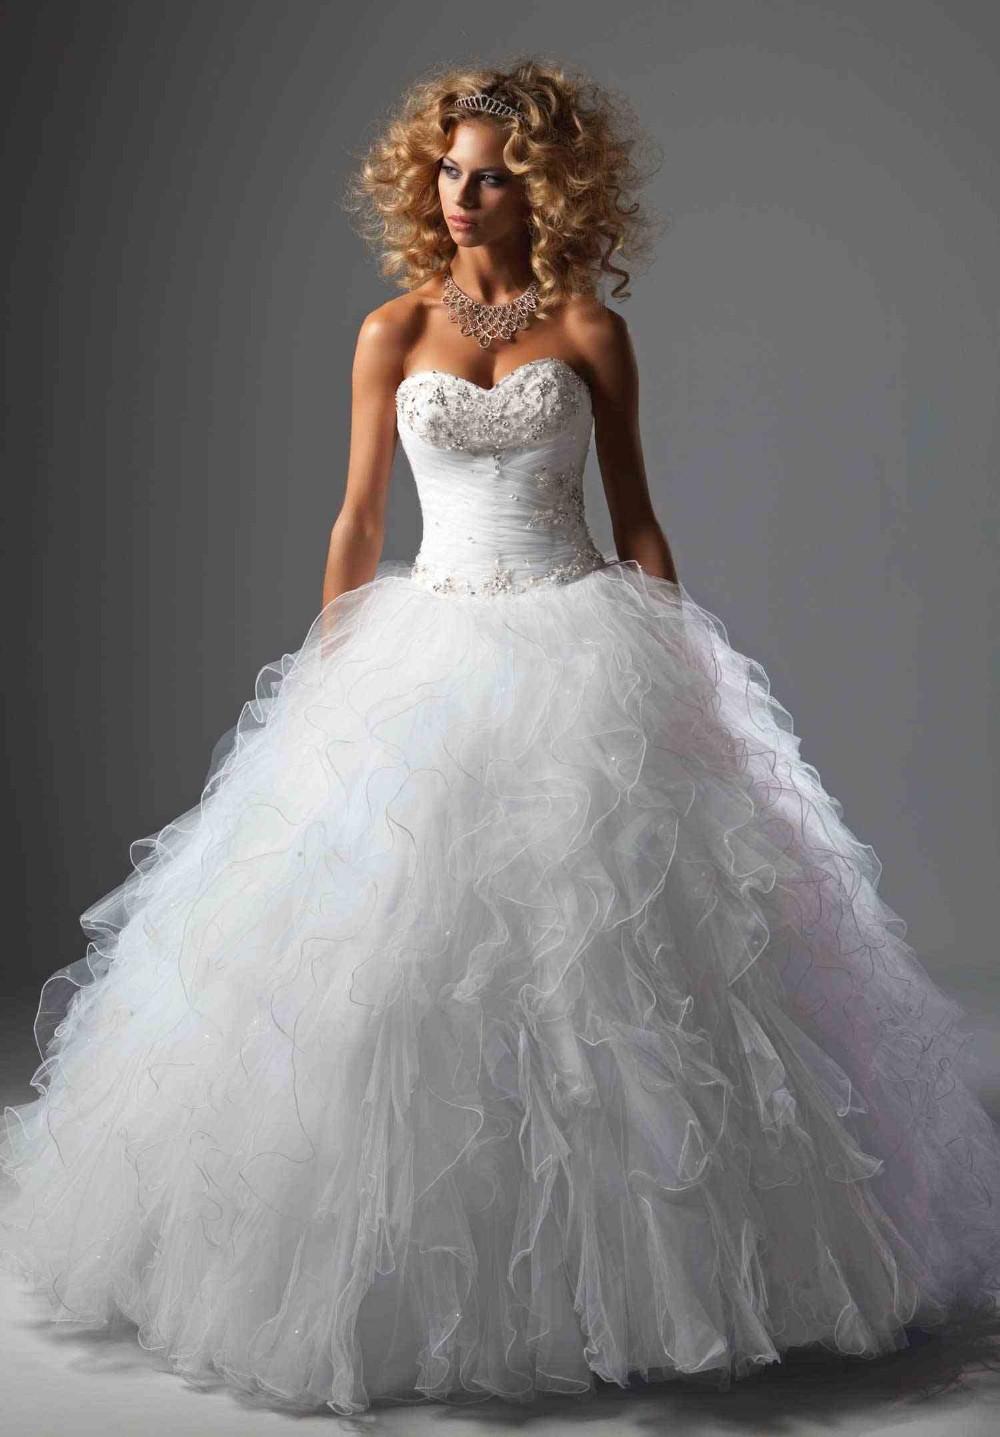 Vizcaya-Quinceanera-Dresses-Prom-Dresses-VIZ_88013-054